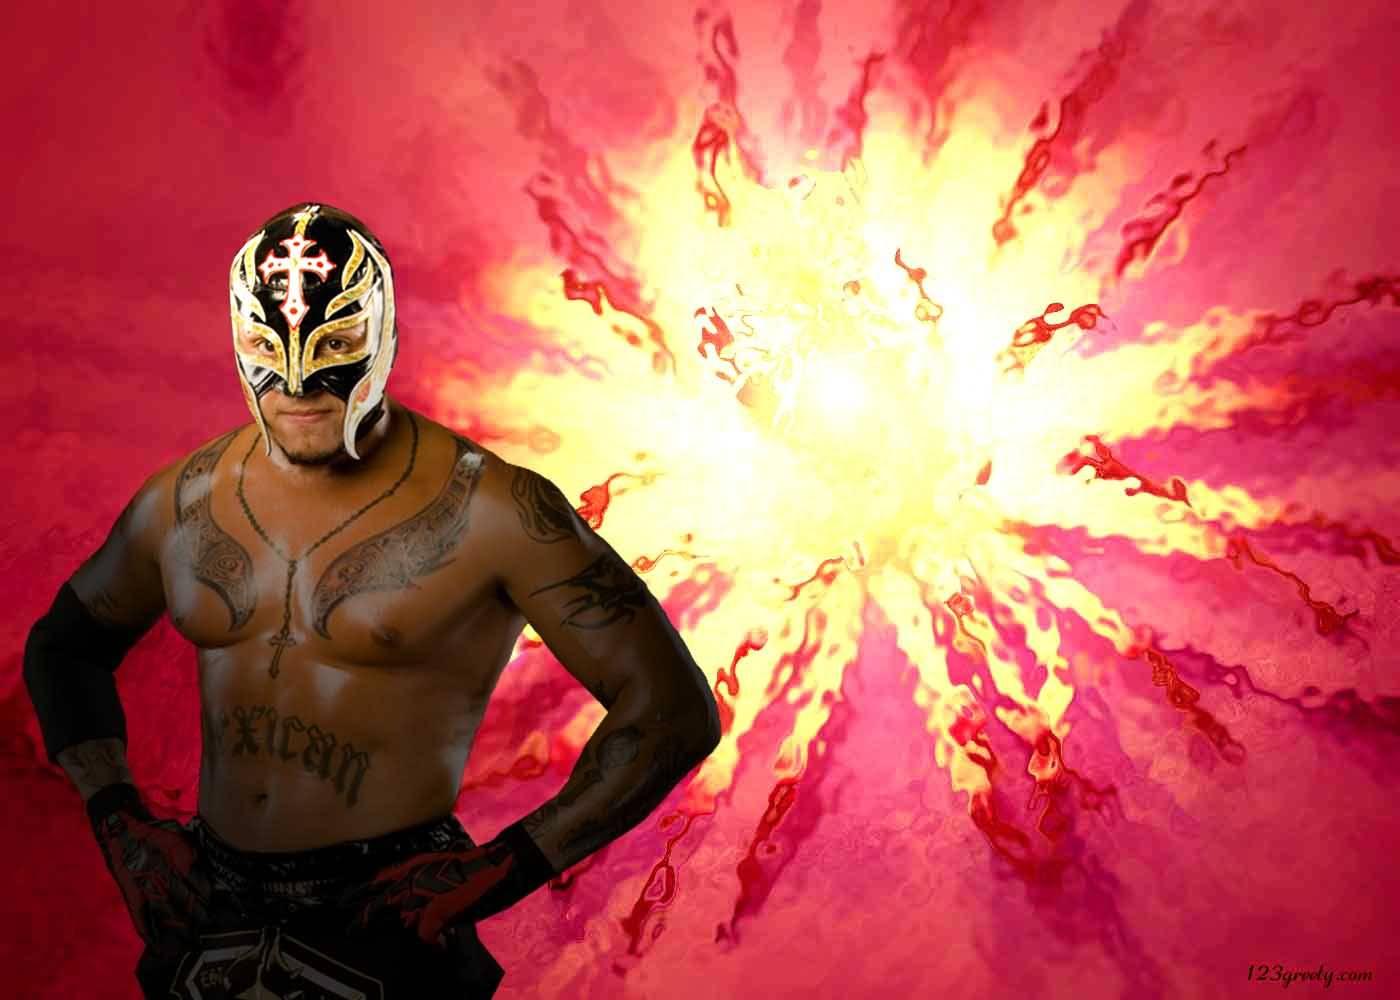 http://1.bp.blogspot.com/-XYhpy95RsLM/UIUqRjZ-5AI/AAAAAAAAEeg/MsW3KZ91_3U/s1600/WWE+Rey+Mysterio+hd+Wallpapers+2012_5.jpg